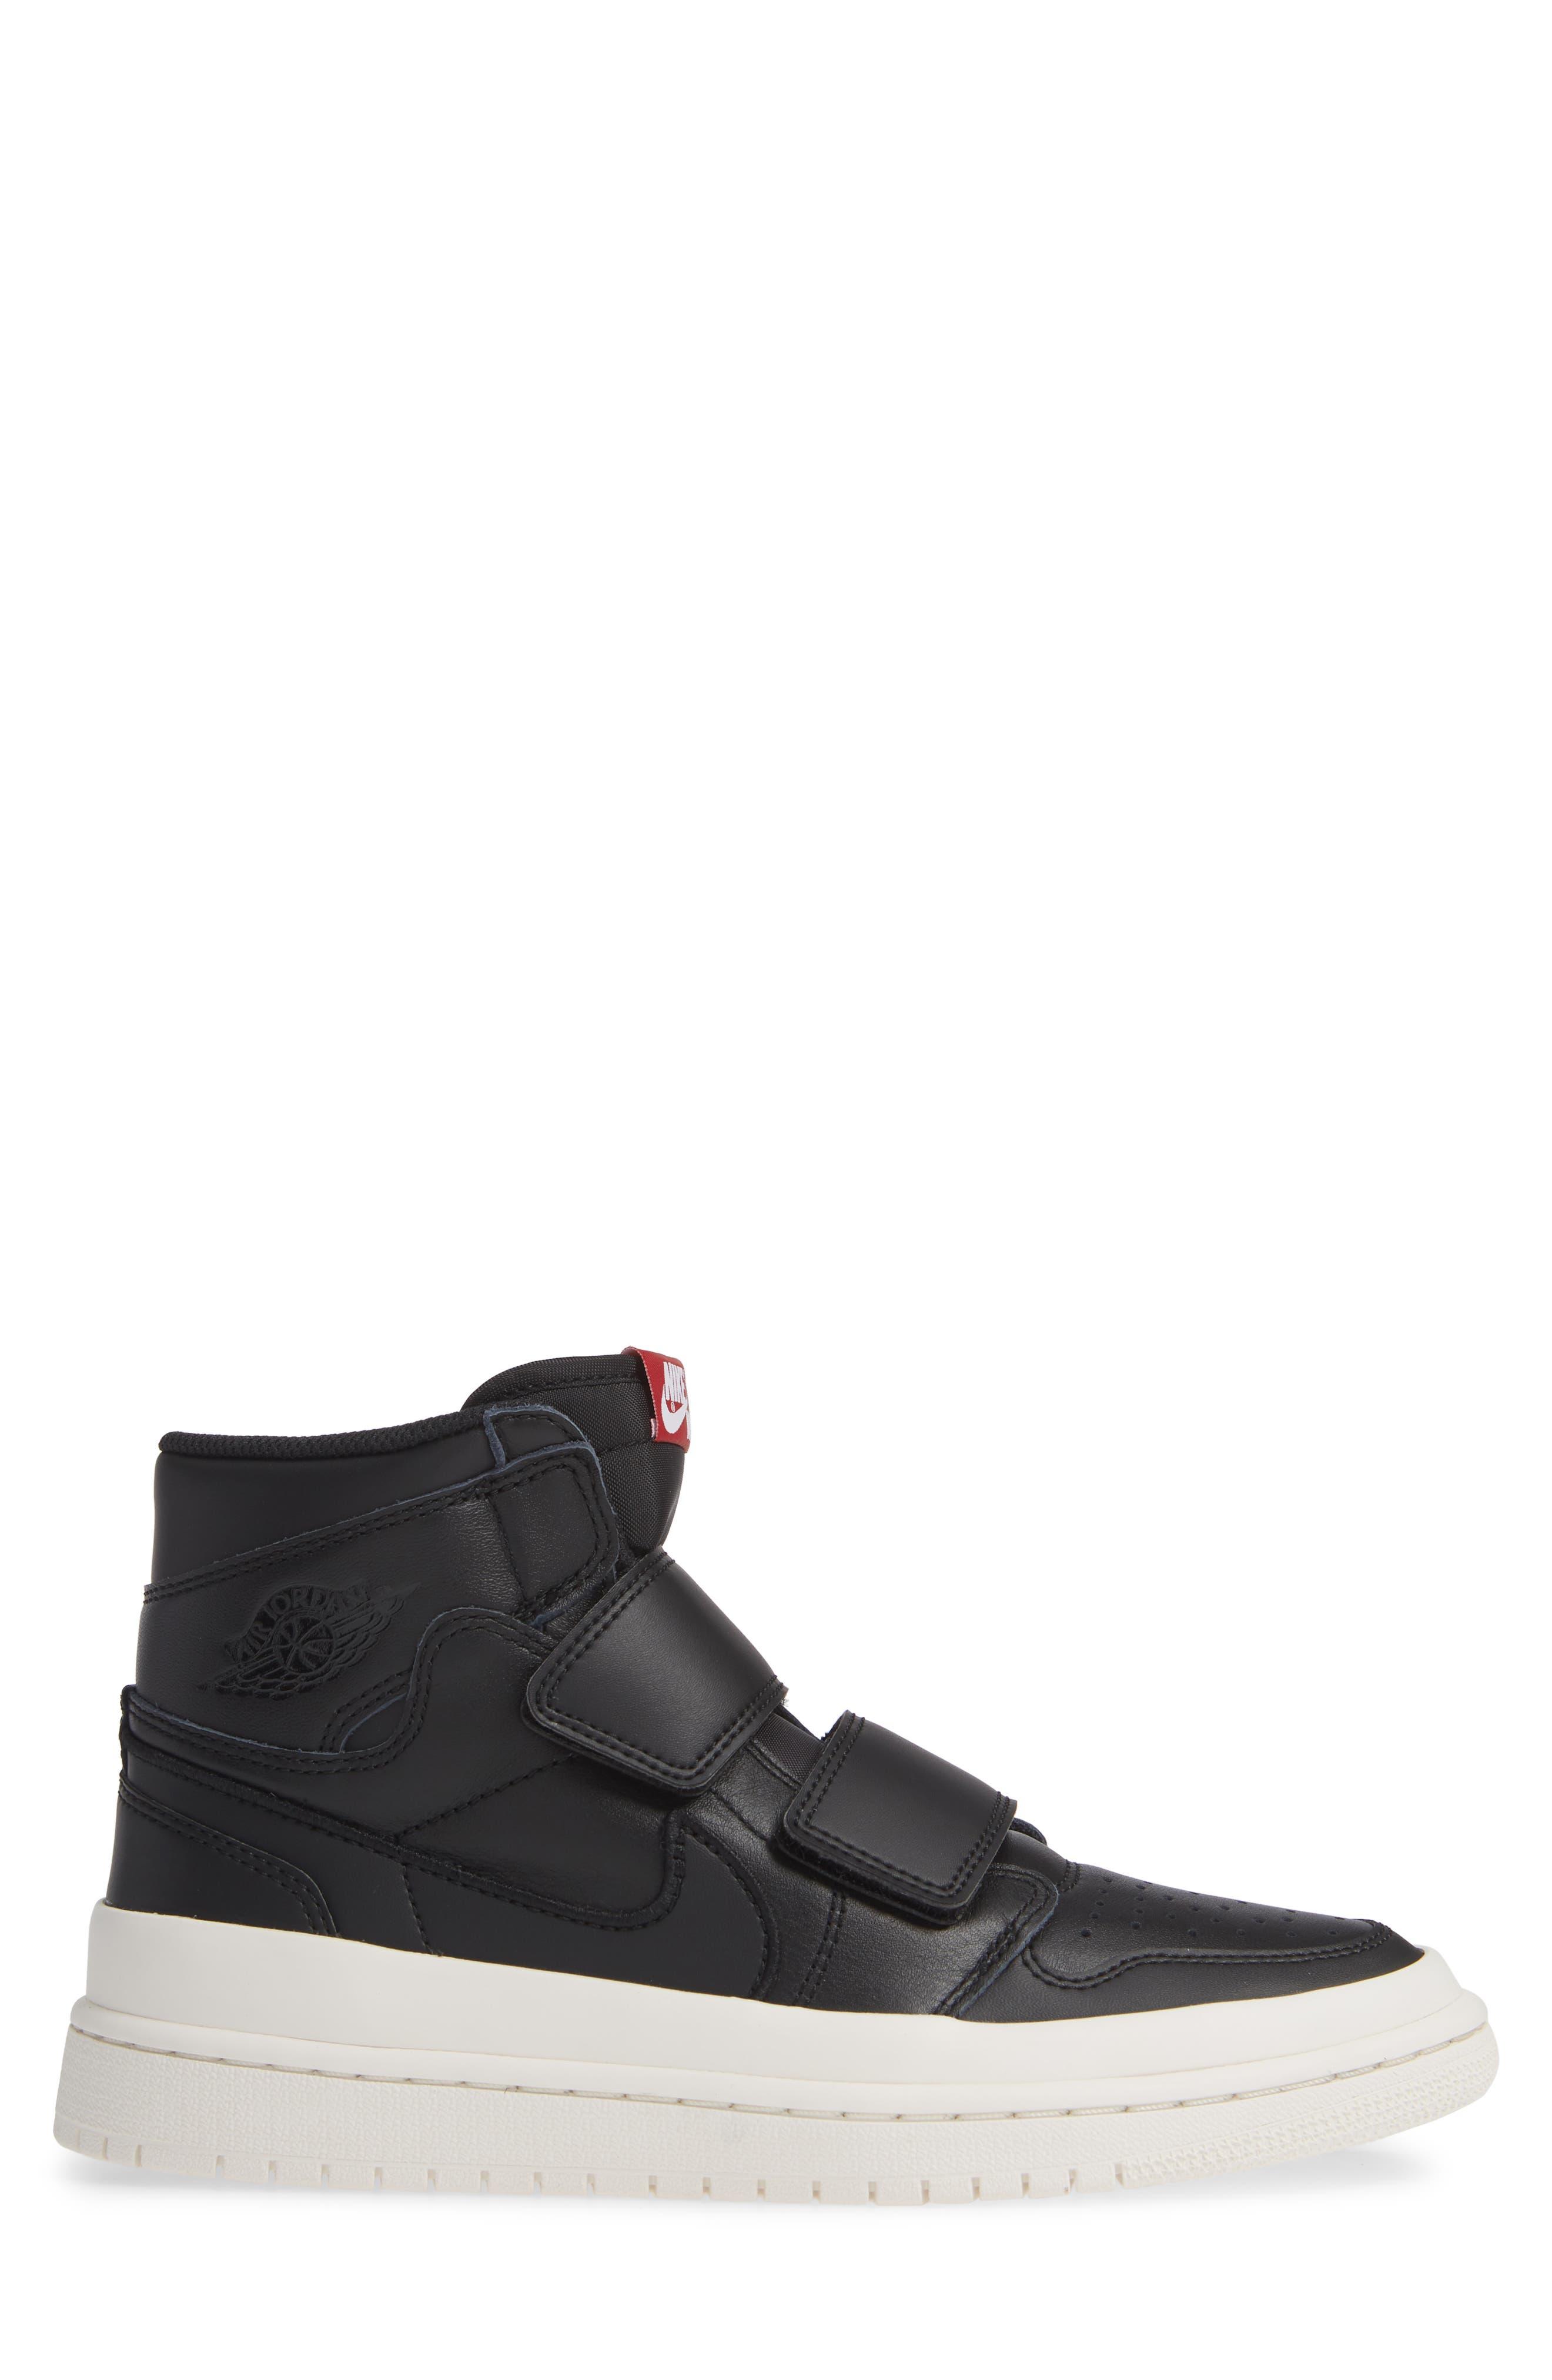 Air Jordan 1 Retro High Double Strap Sneaker,                             Alternate thumbnail 3, color,                             BLACK/ GYM RED